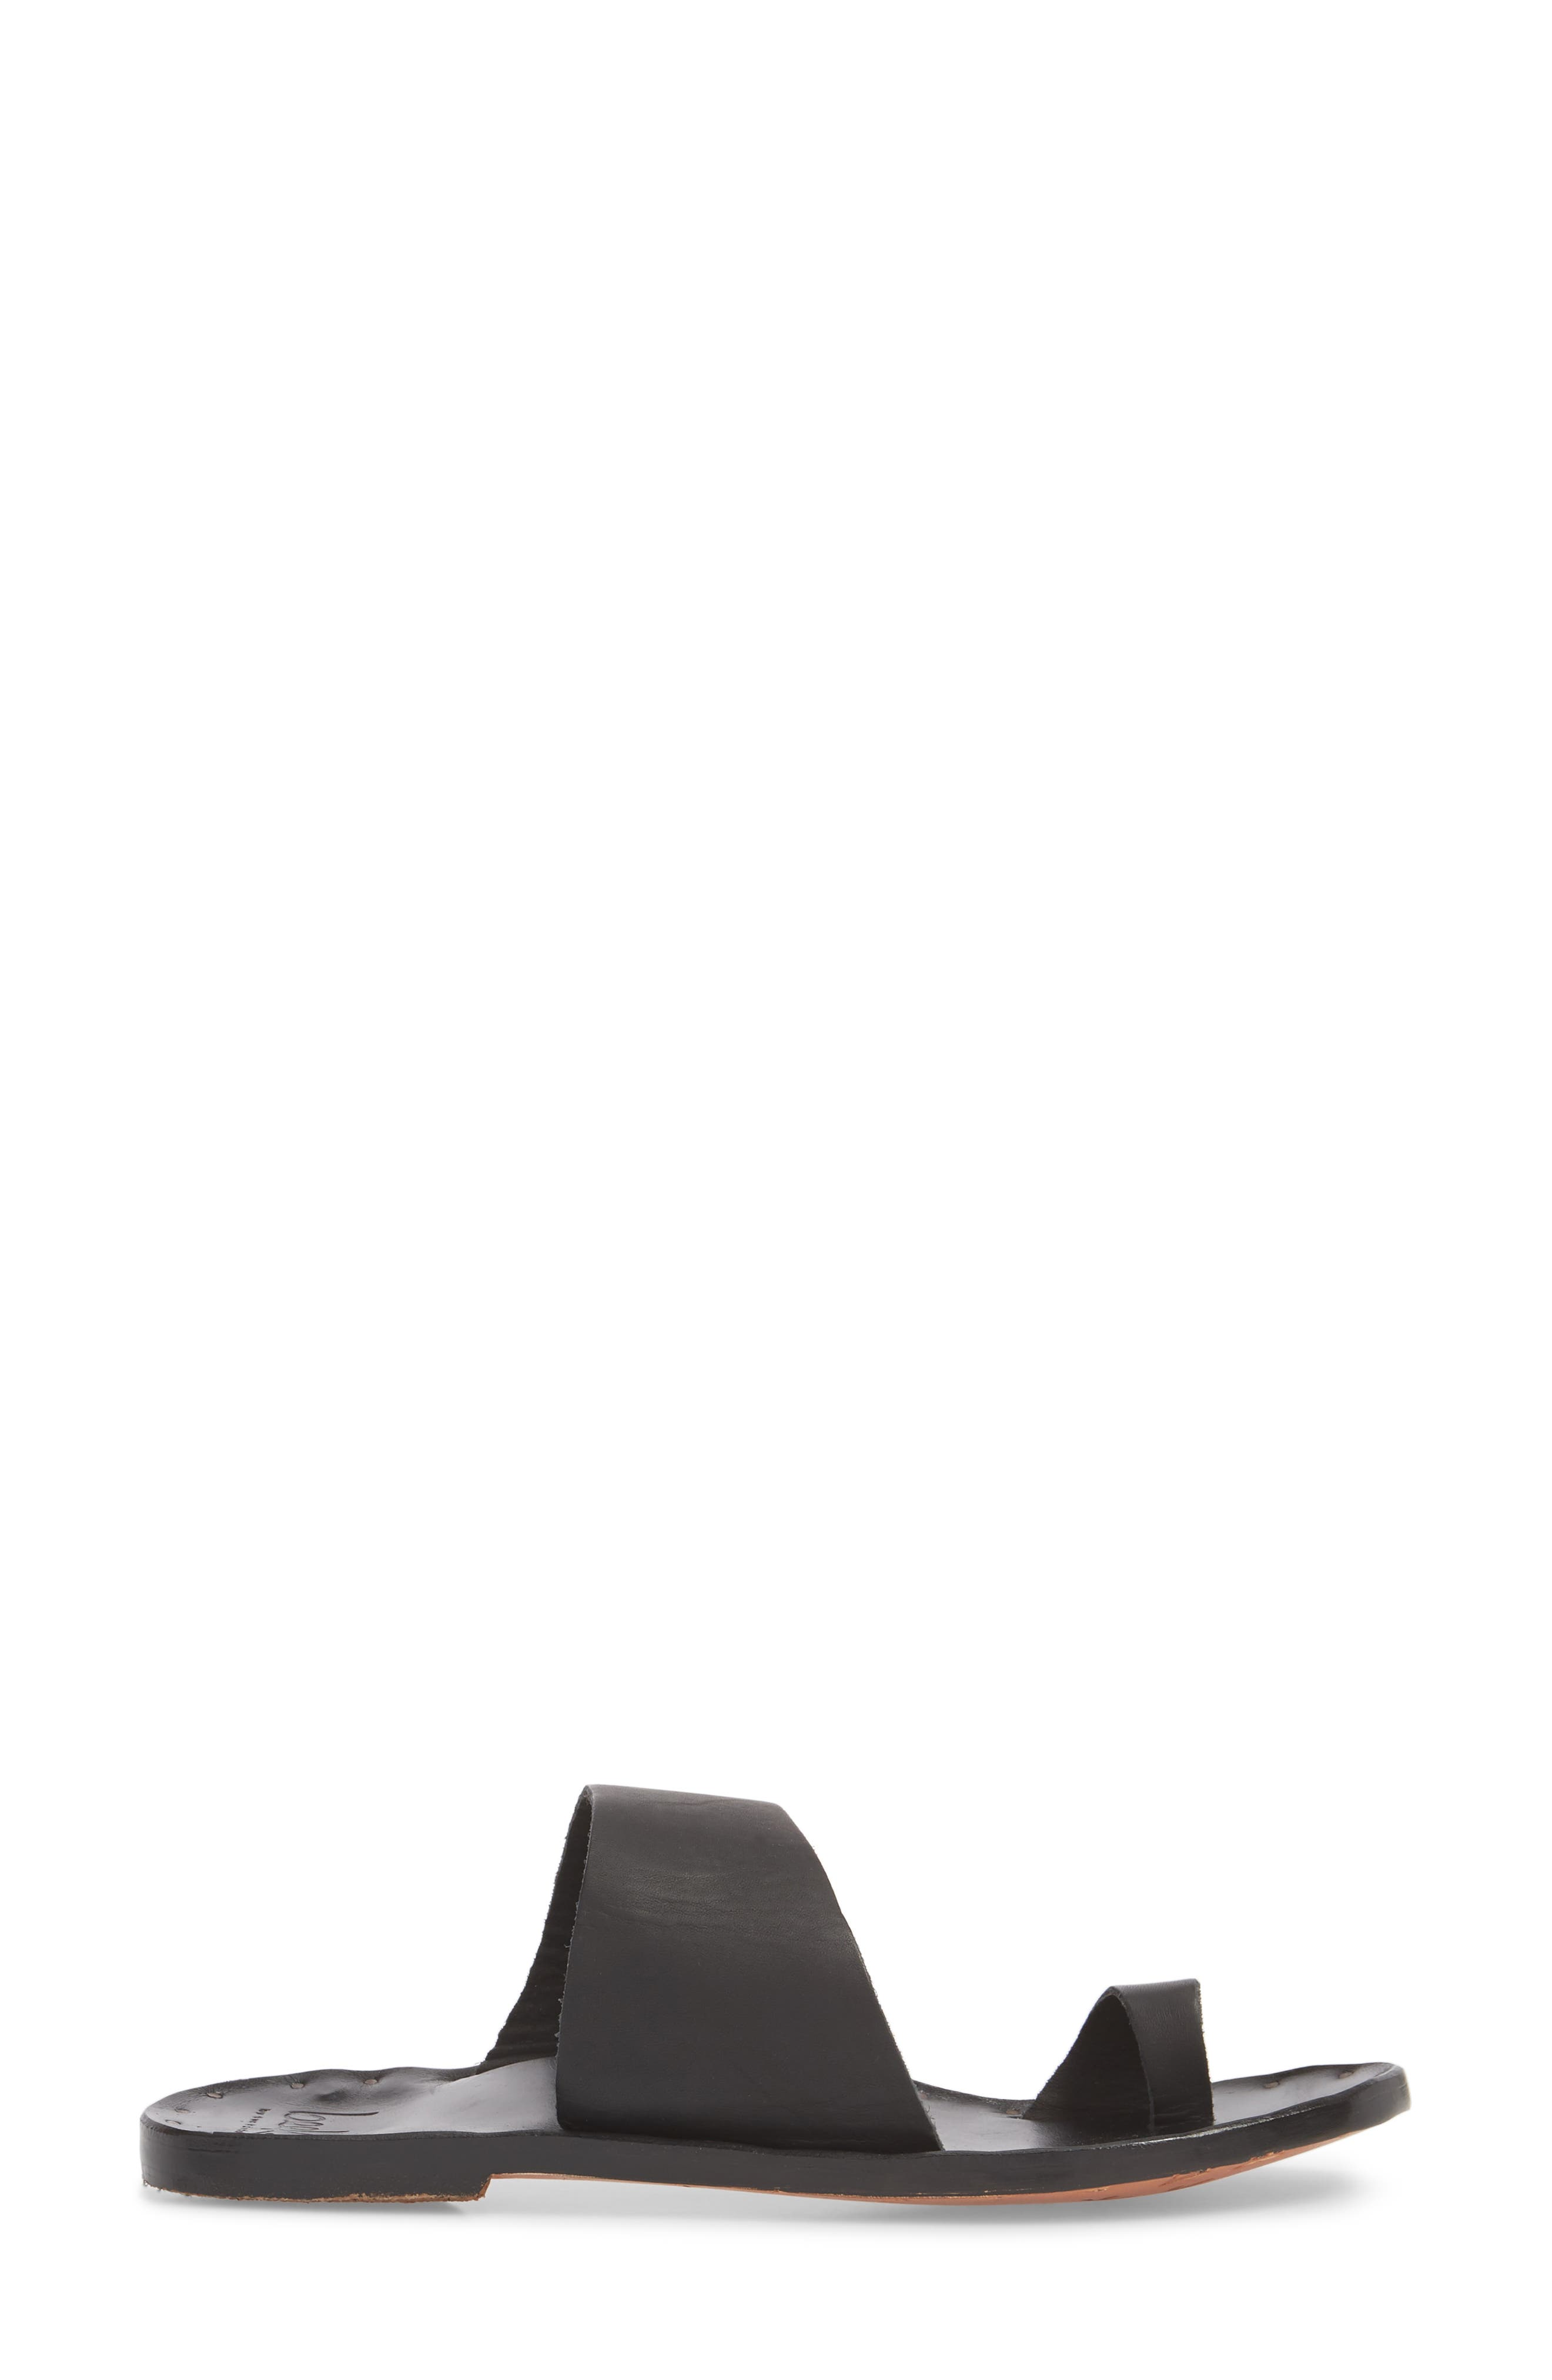 BEEK, Finch Sandal, Alternate thumbnail 3, color, BLACK/ BLACK